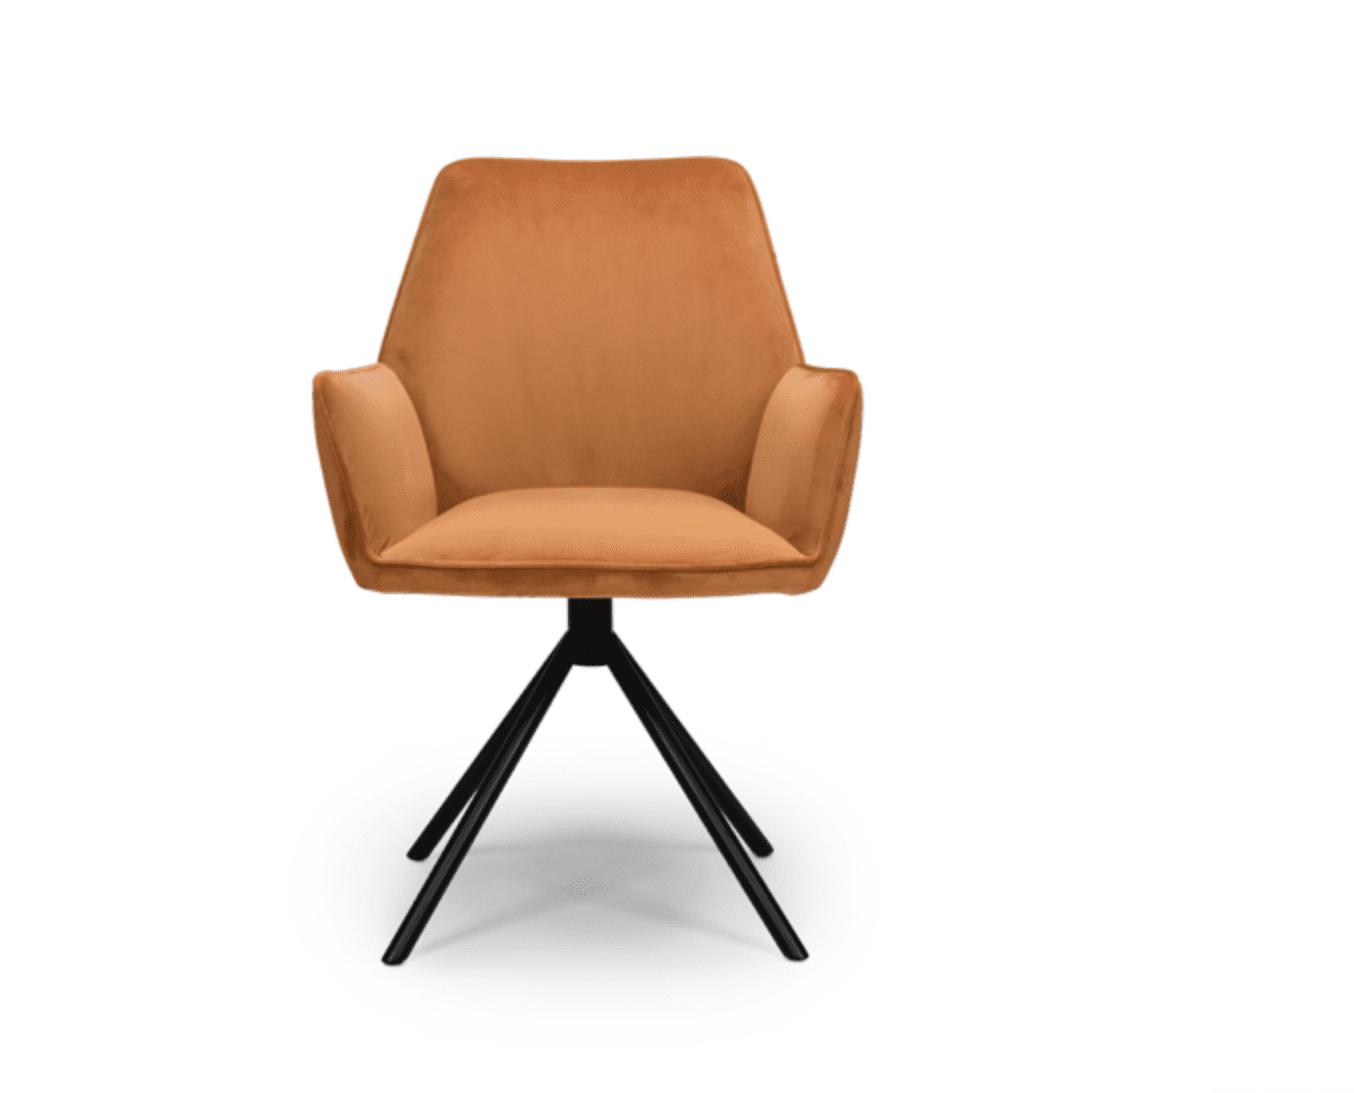 UNO chair burnt orange